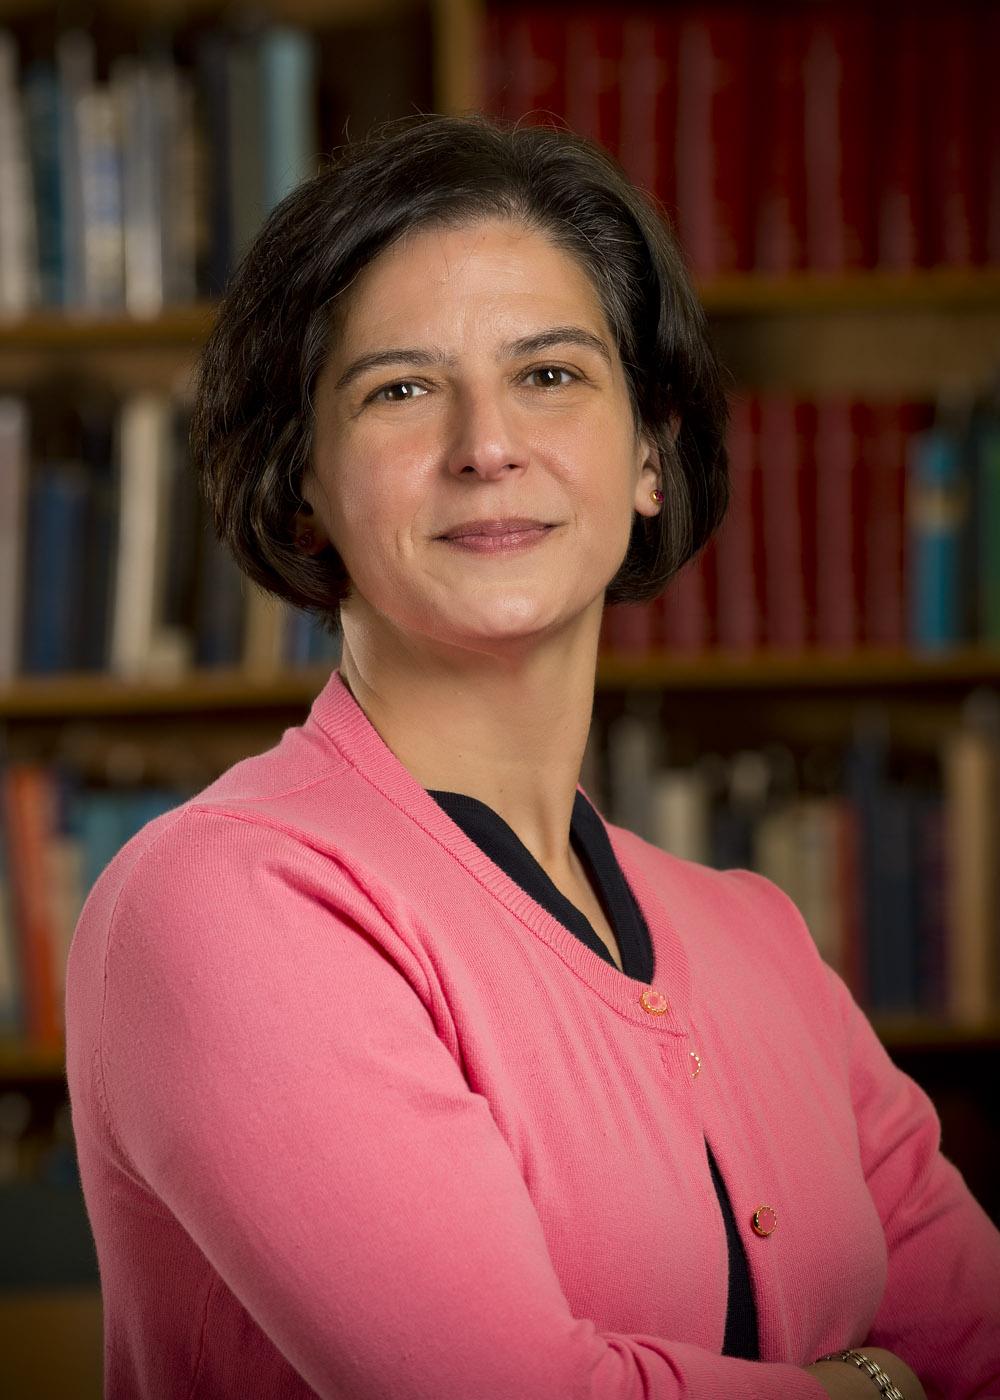 Nicole Borges